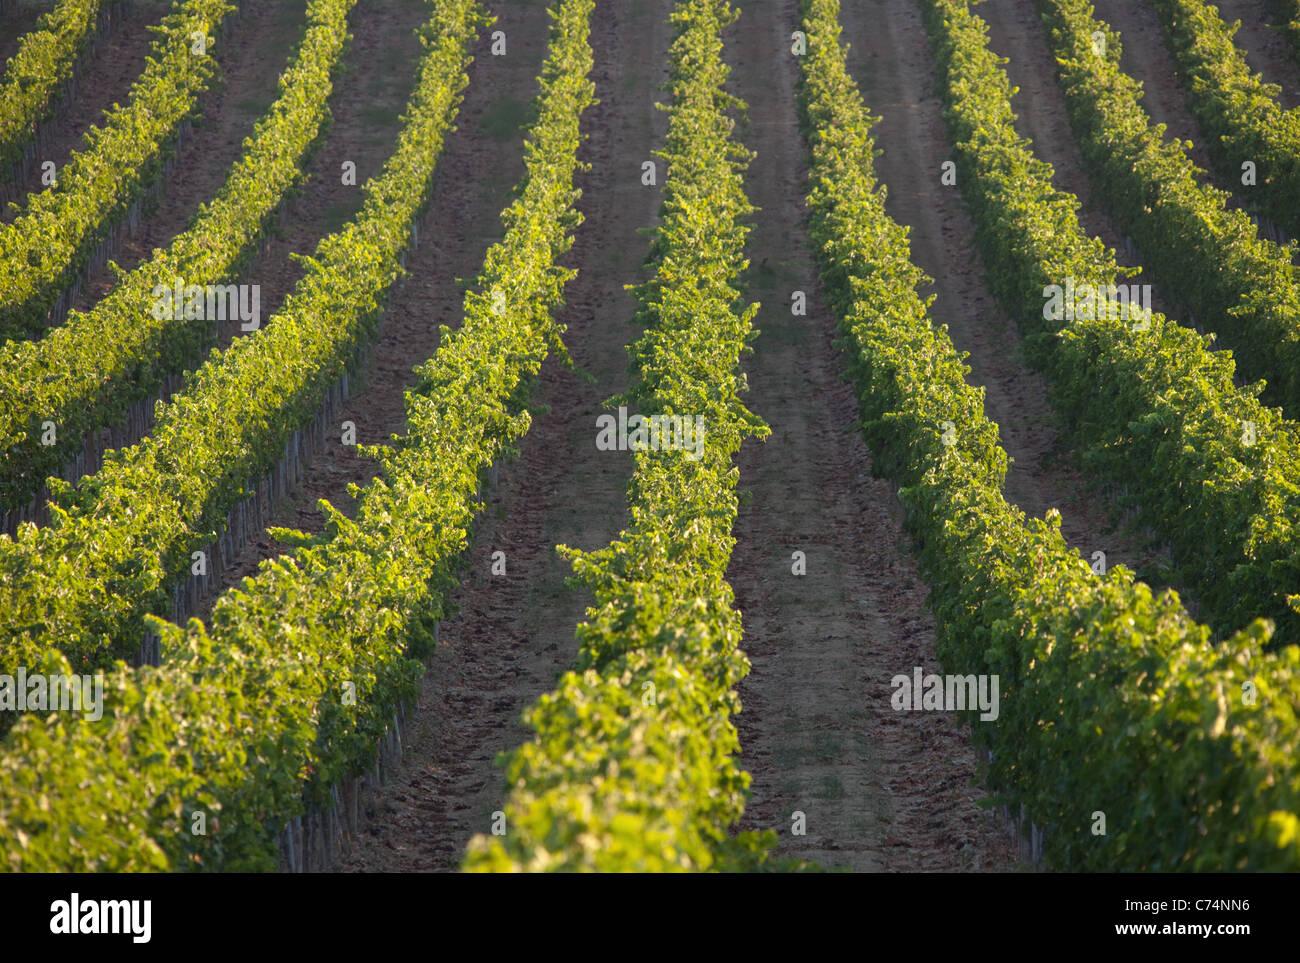 Rows of vines in the Bulgari vineyard near San Casciano dei bagni ...